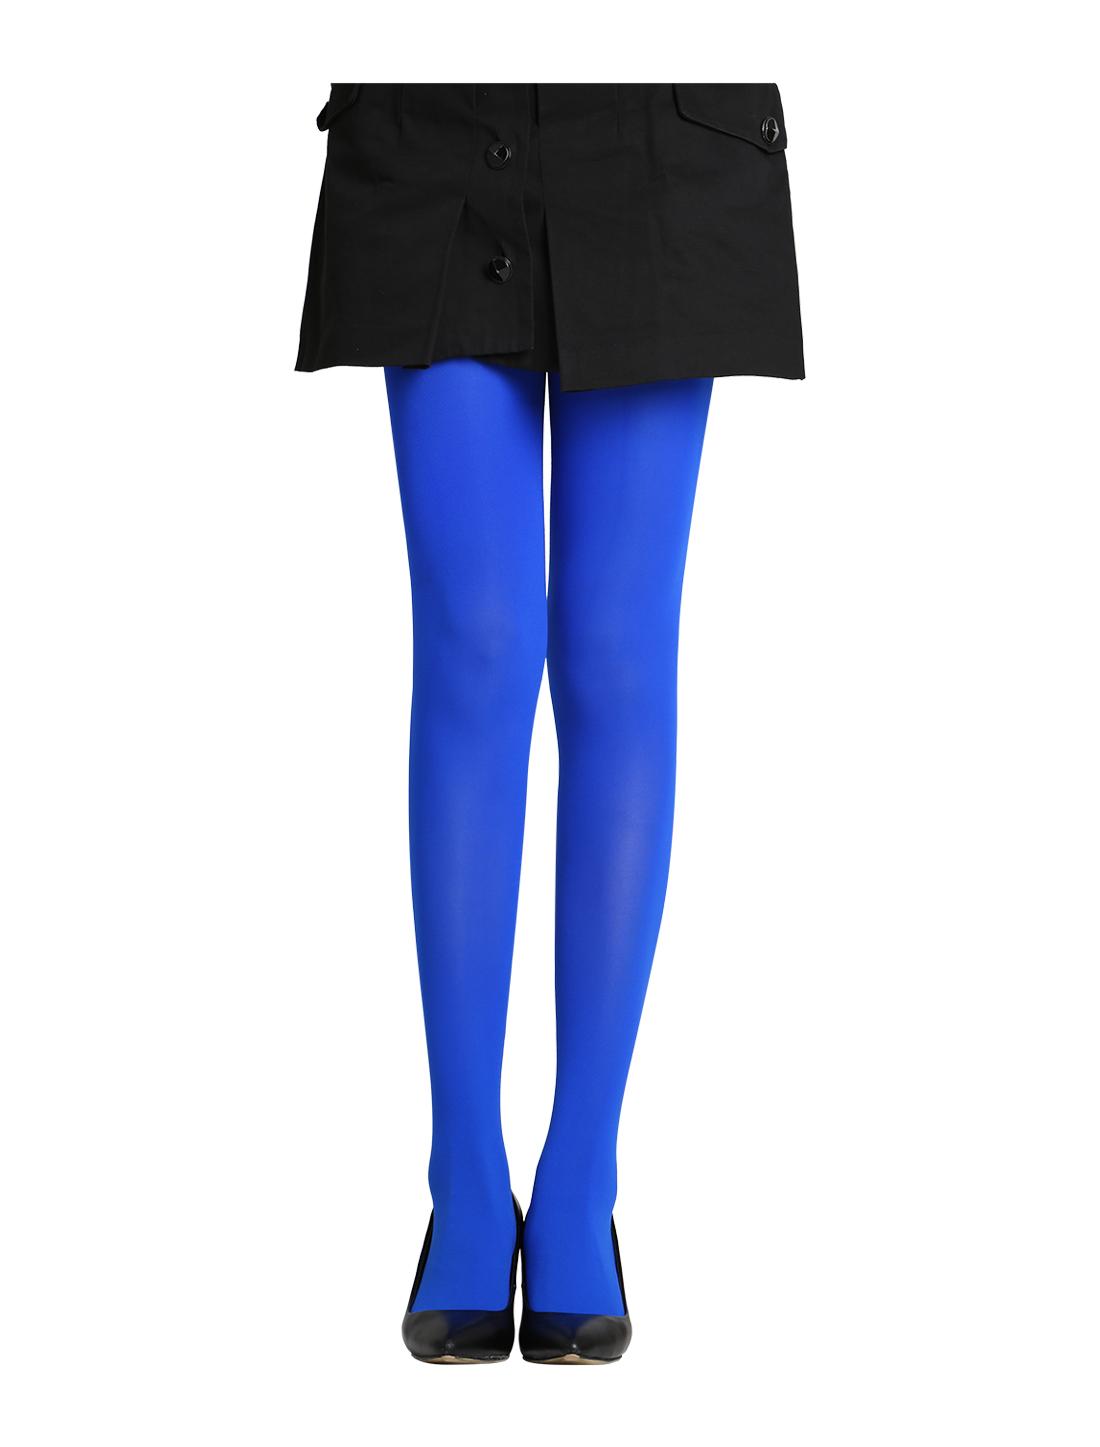 Women 1 Pack Control Top Sheer To Waist Toe Pantyhose Royal XS